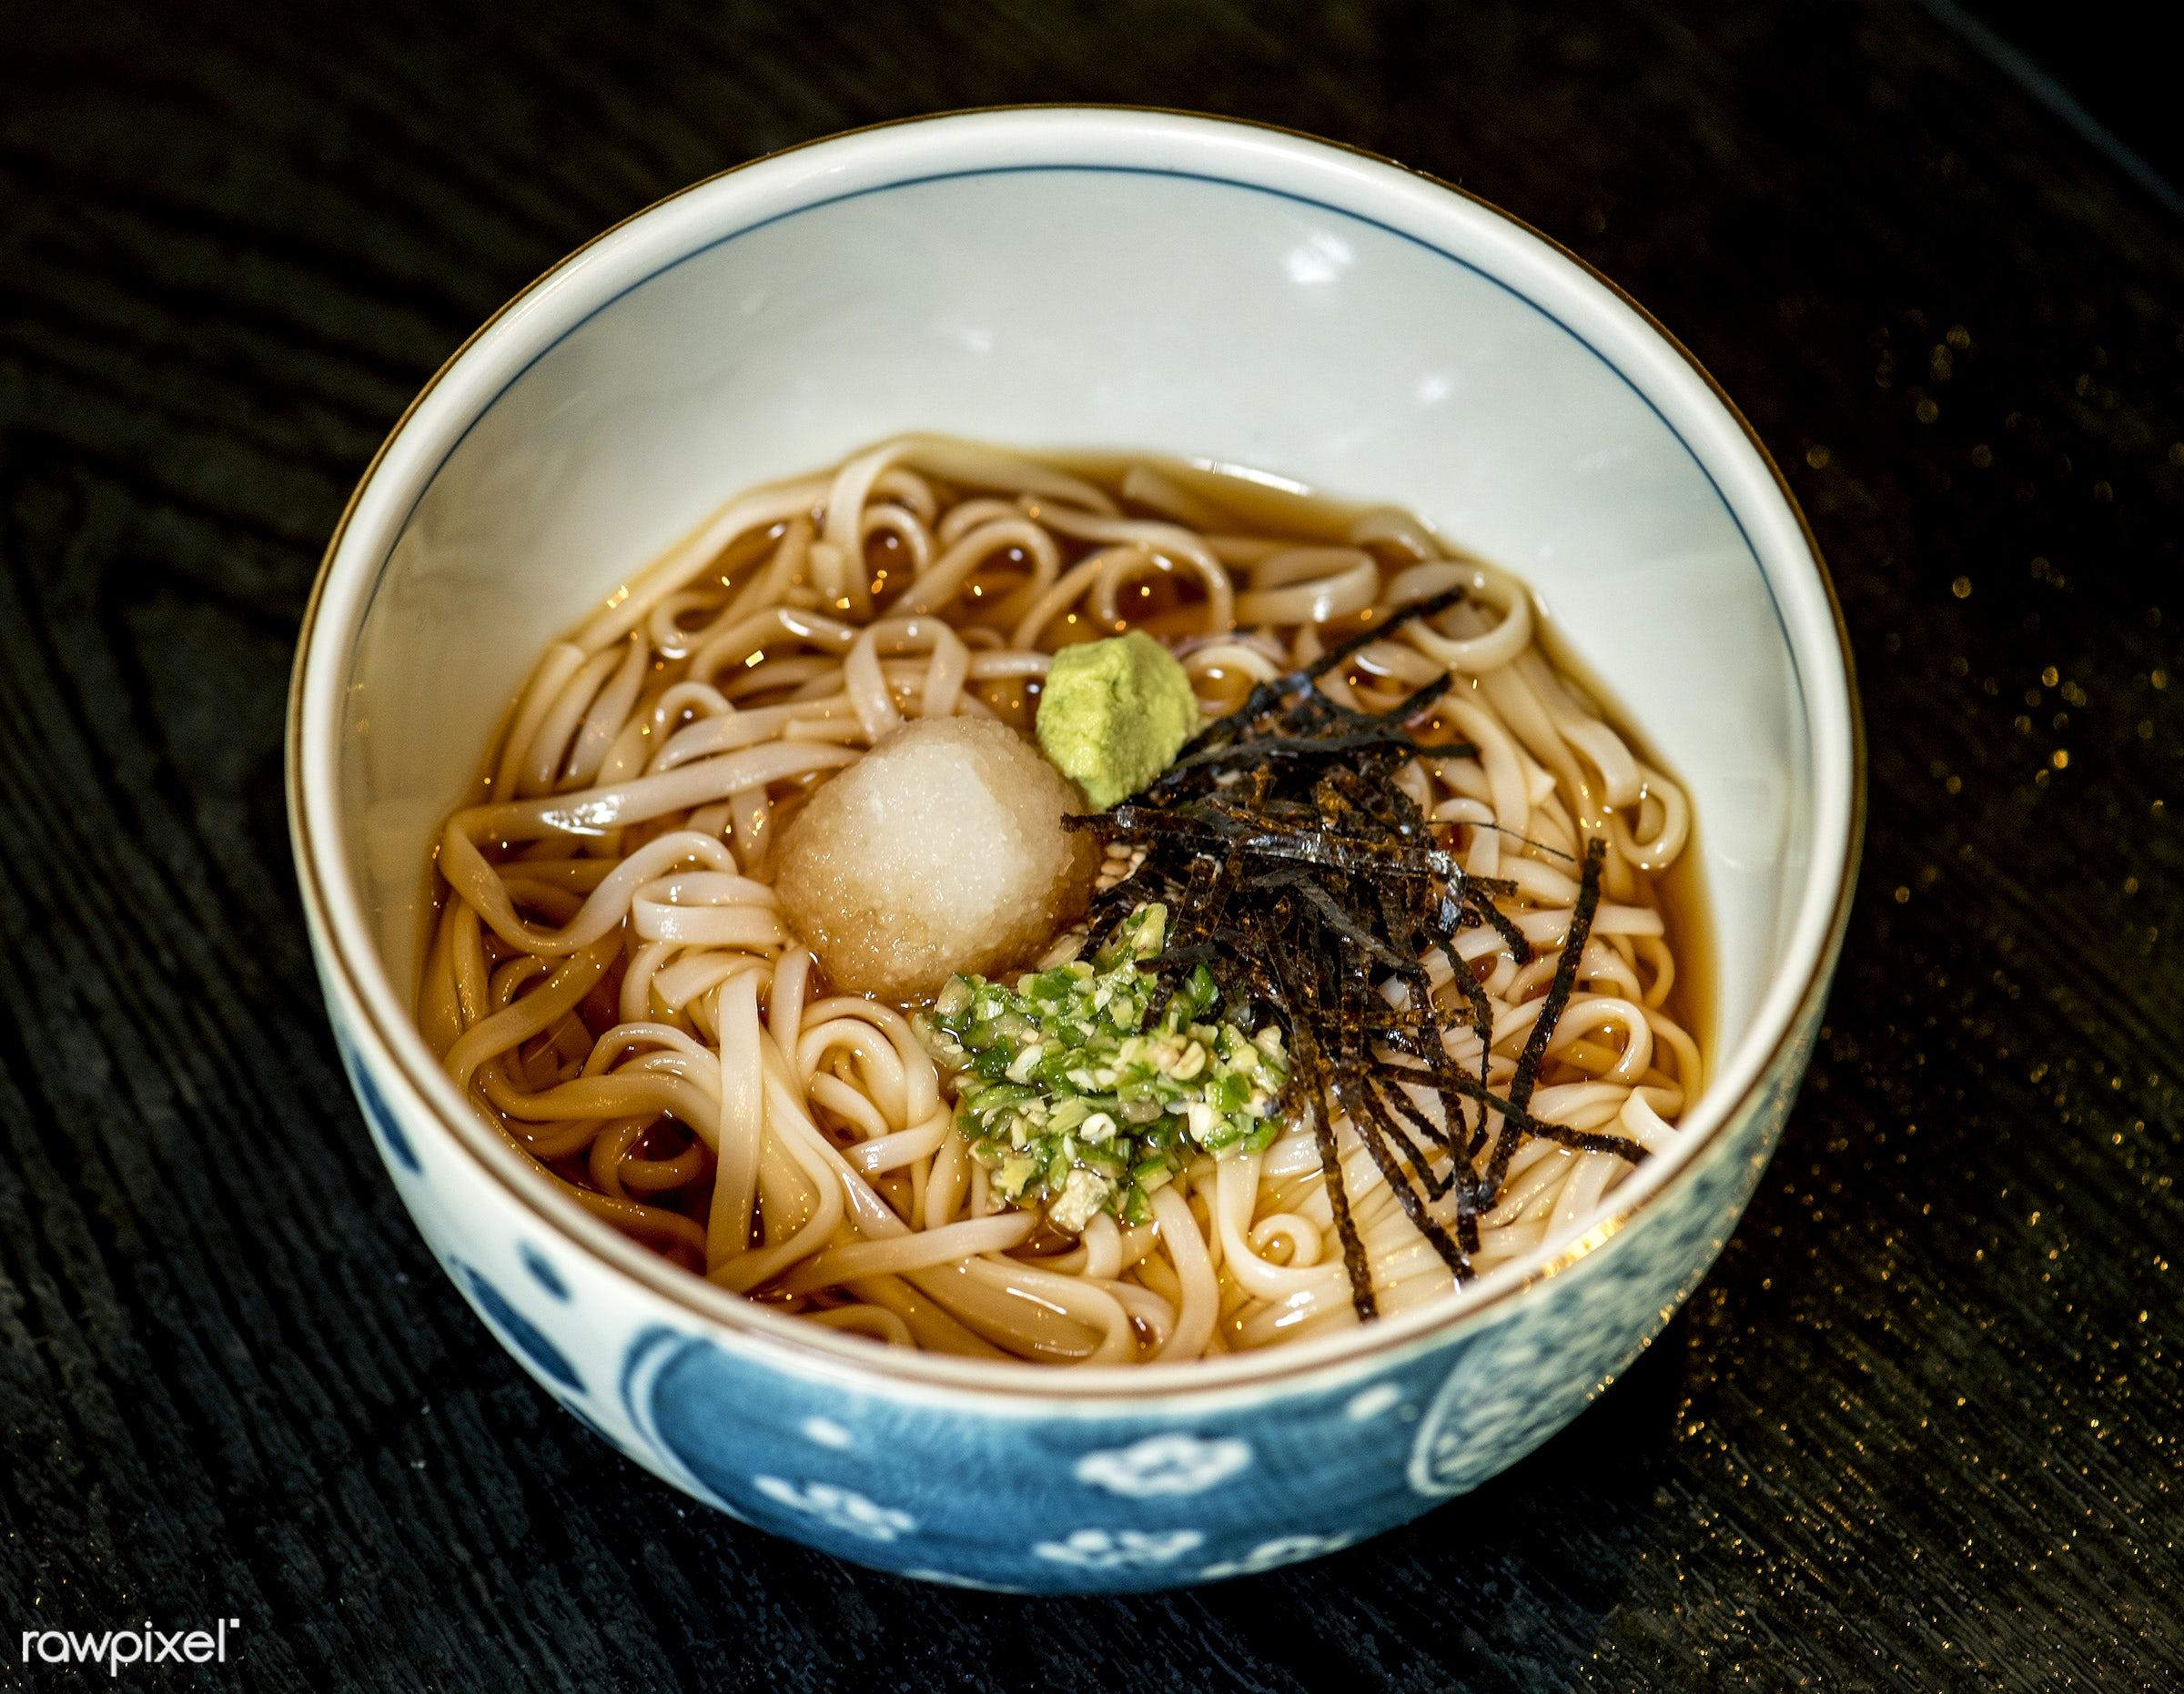 Japanese cuisine - japan, oriental, asia, asian, bowl, closeup, cuisine, delicious, eating, food, fresh, gourmet, healthy,...